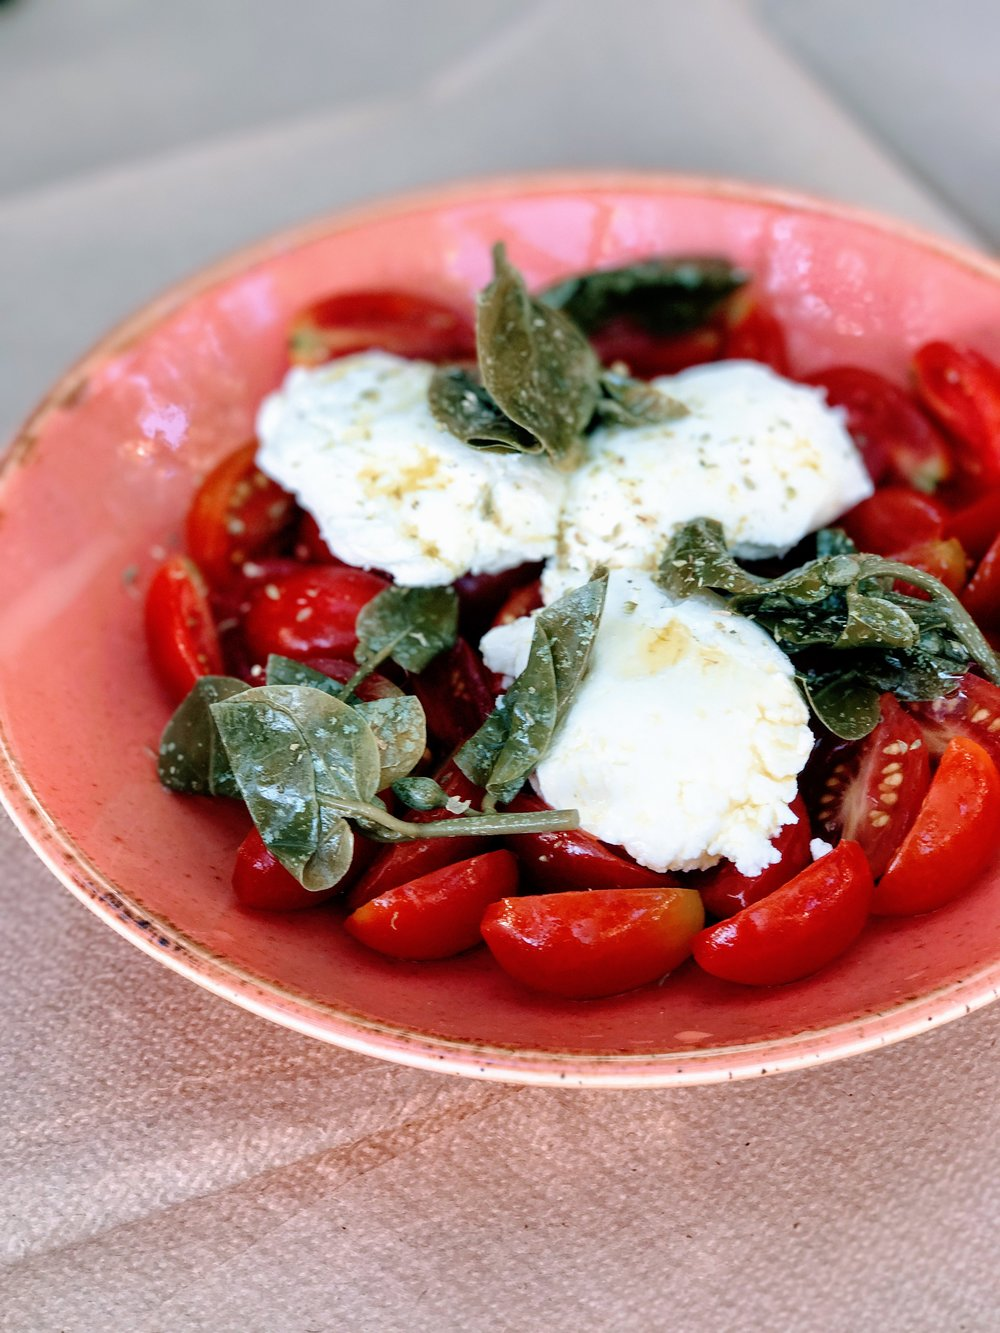 Tomato caper salad at Klimataria taverna